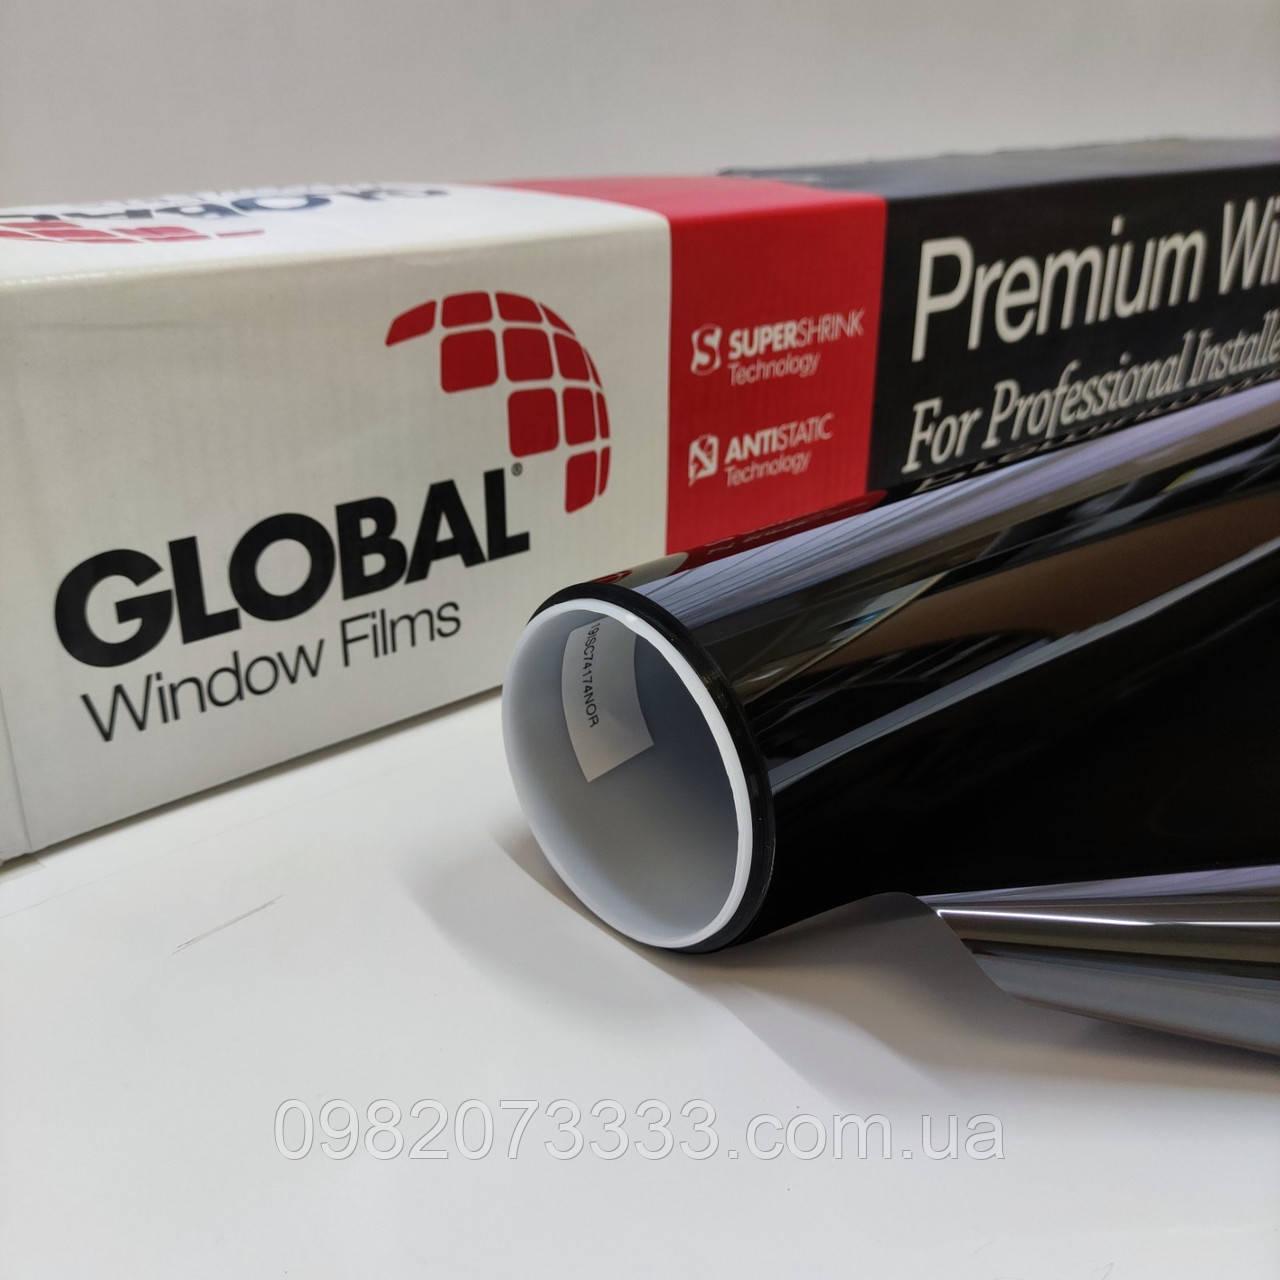 Тонировочная пленка NRI CH05 ширина 1,524(США) Global антистатичная. Тонувальна плівка. Глобал (цена за кв.м)